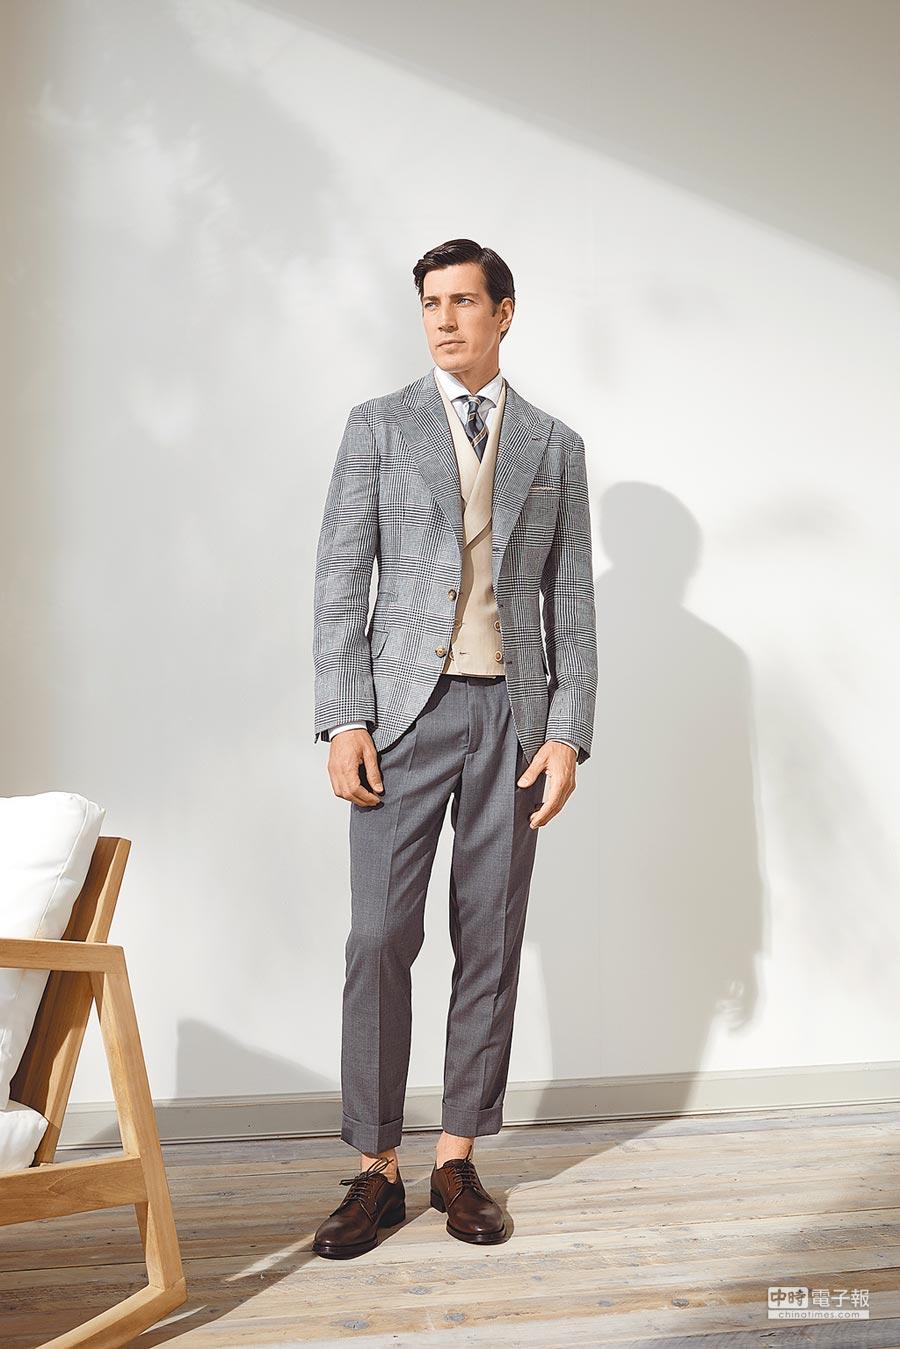 BRUNELLO CUCINELLI春夏劍領格紋西裝外套12萬8600元,雙排釦羊毛西裝背心6萬1900元,其他價格店洽。(BRUNELLO CUCINELLI提供)